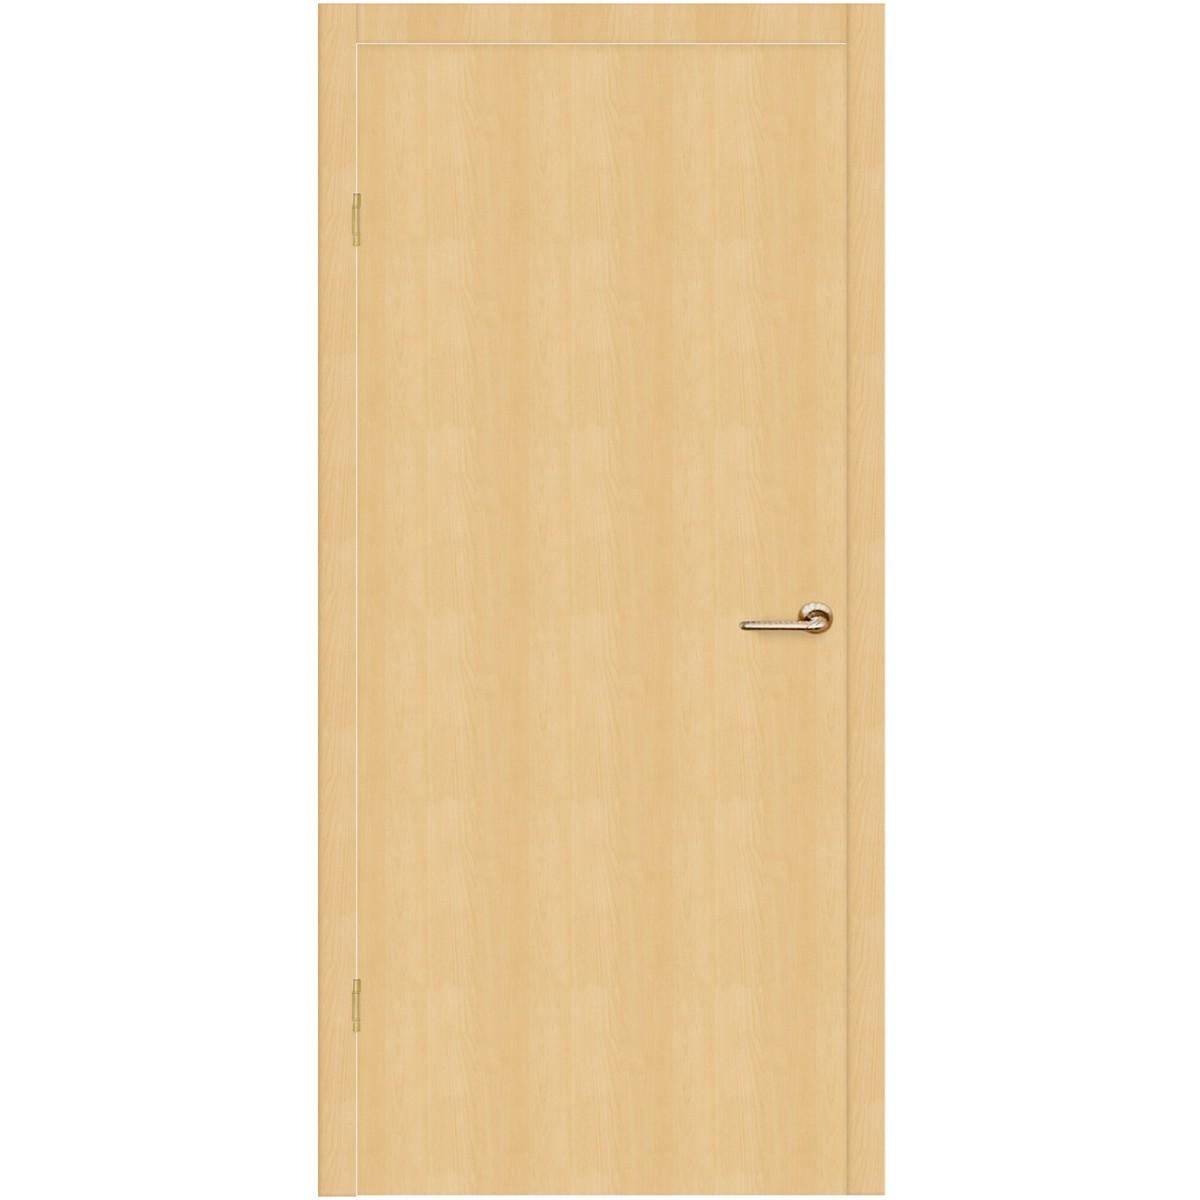 Дверь межкомнатная глухая Belleza 60x200 см ламинация цвет дуб белый